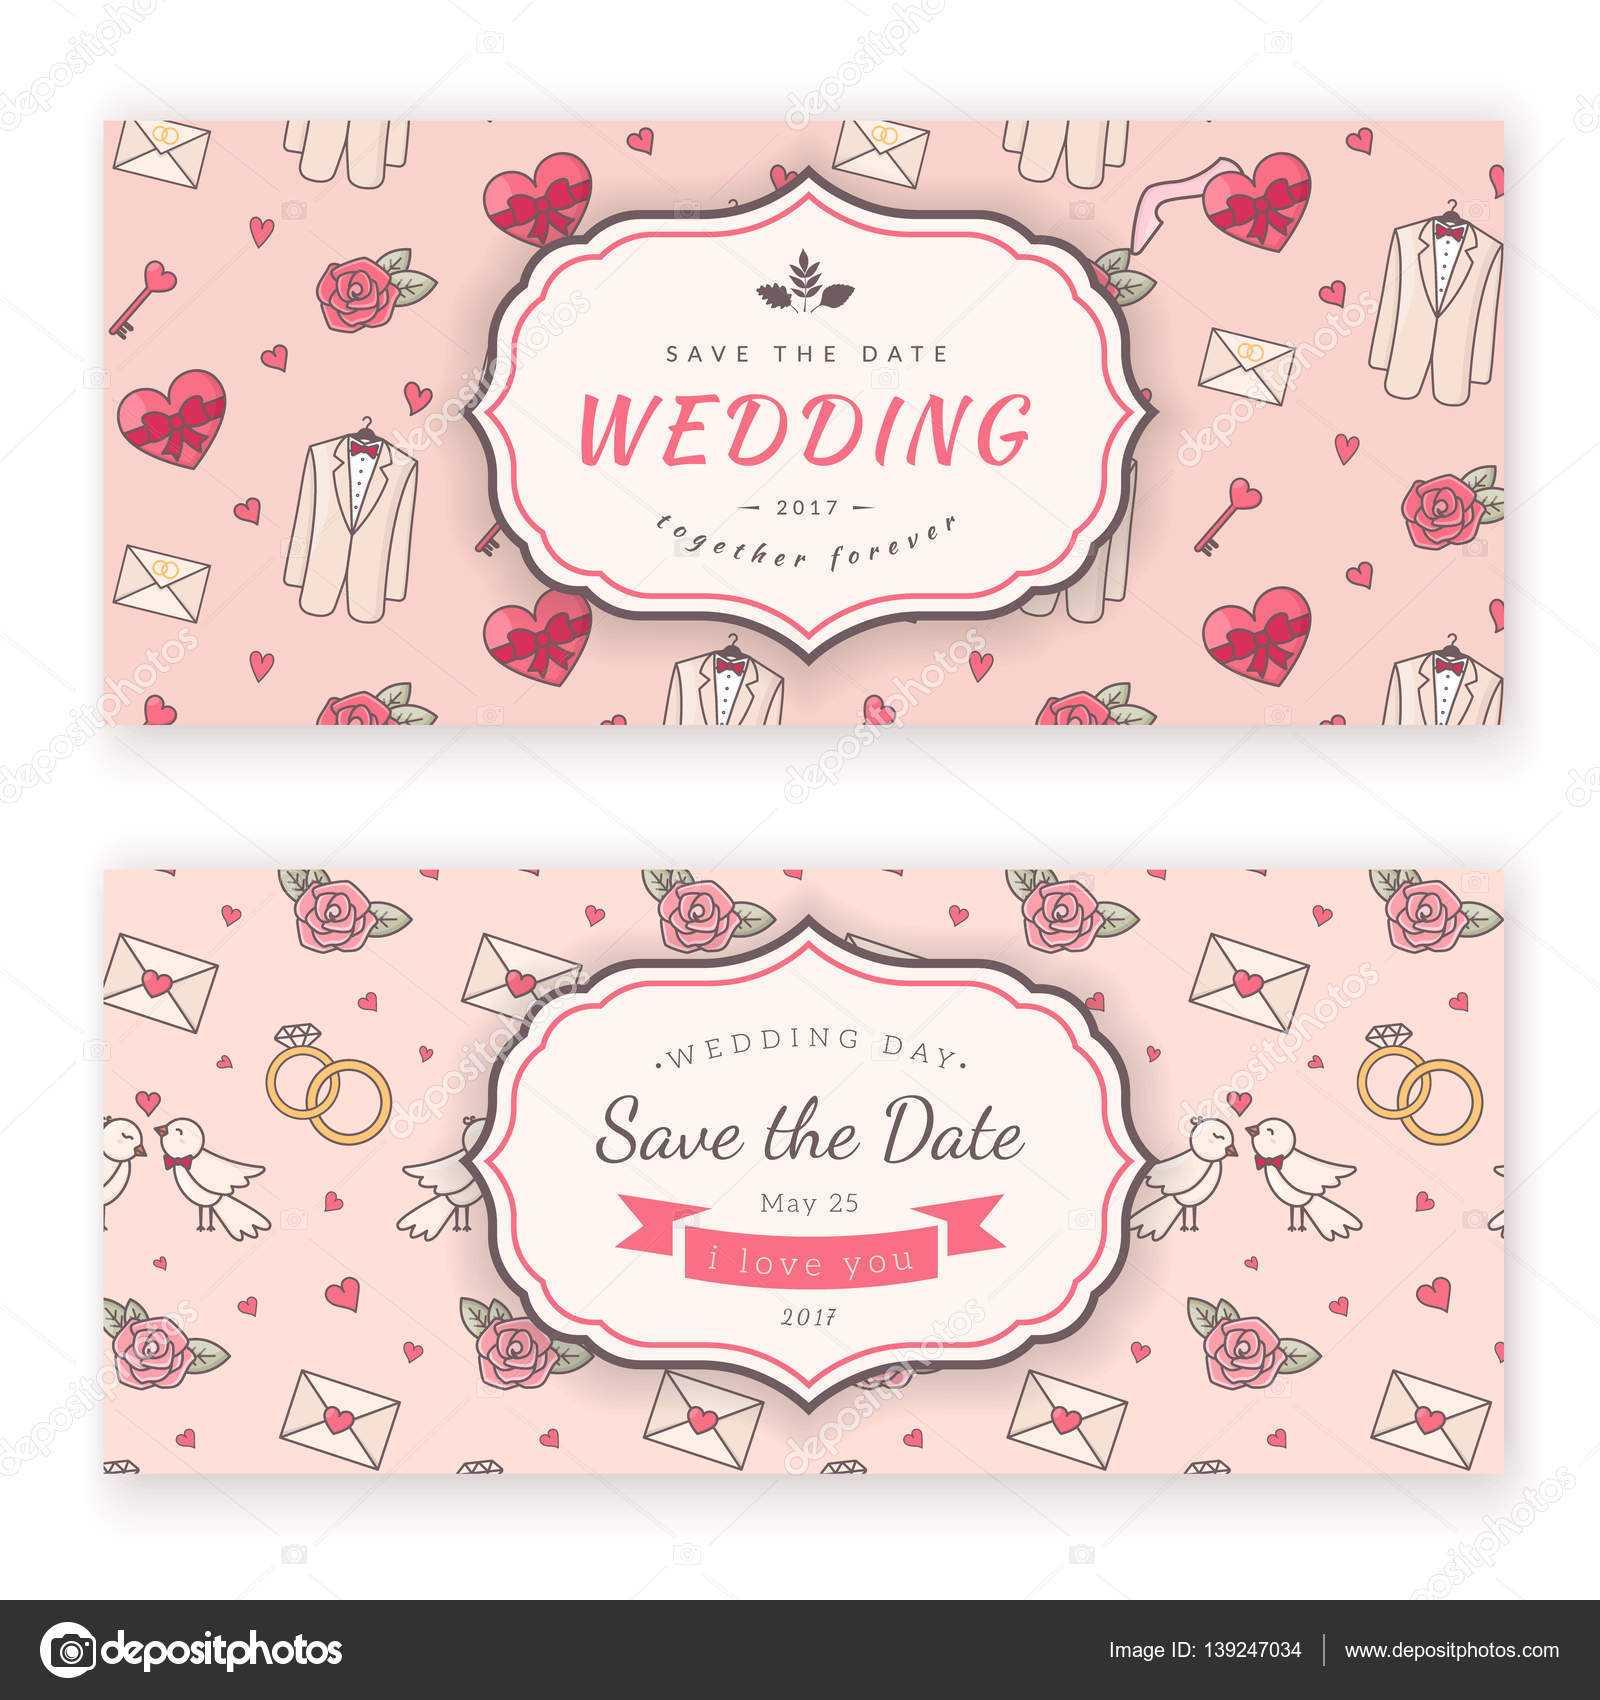 Wedding Banner Template. — Stock Vector © Chuhail #139247034 Within Wedding Banner Design Templates